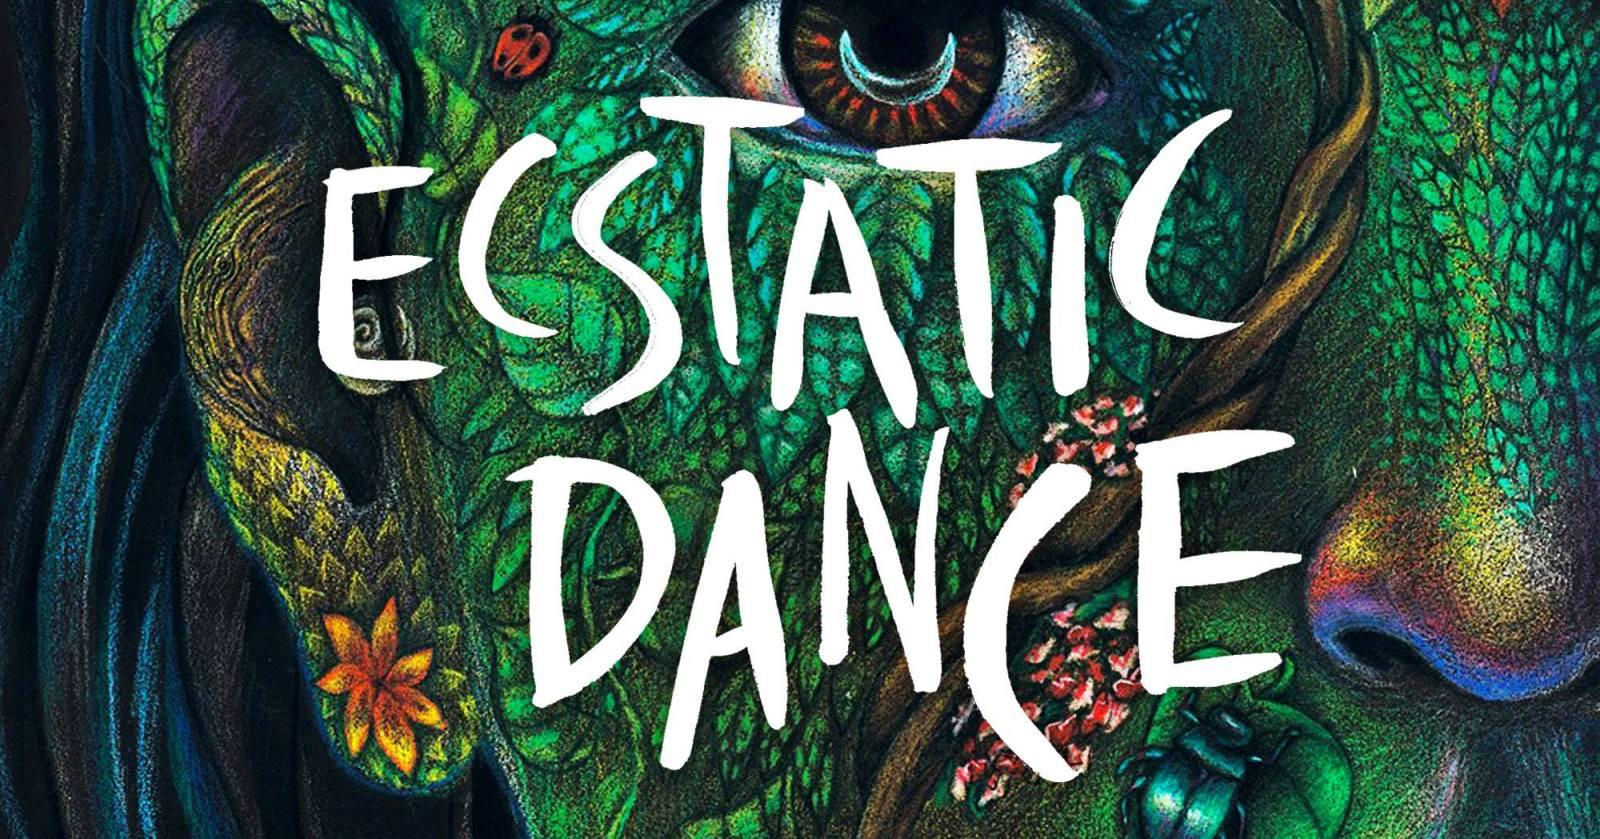 Ecstatic Dance Odessa Amsterdam